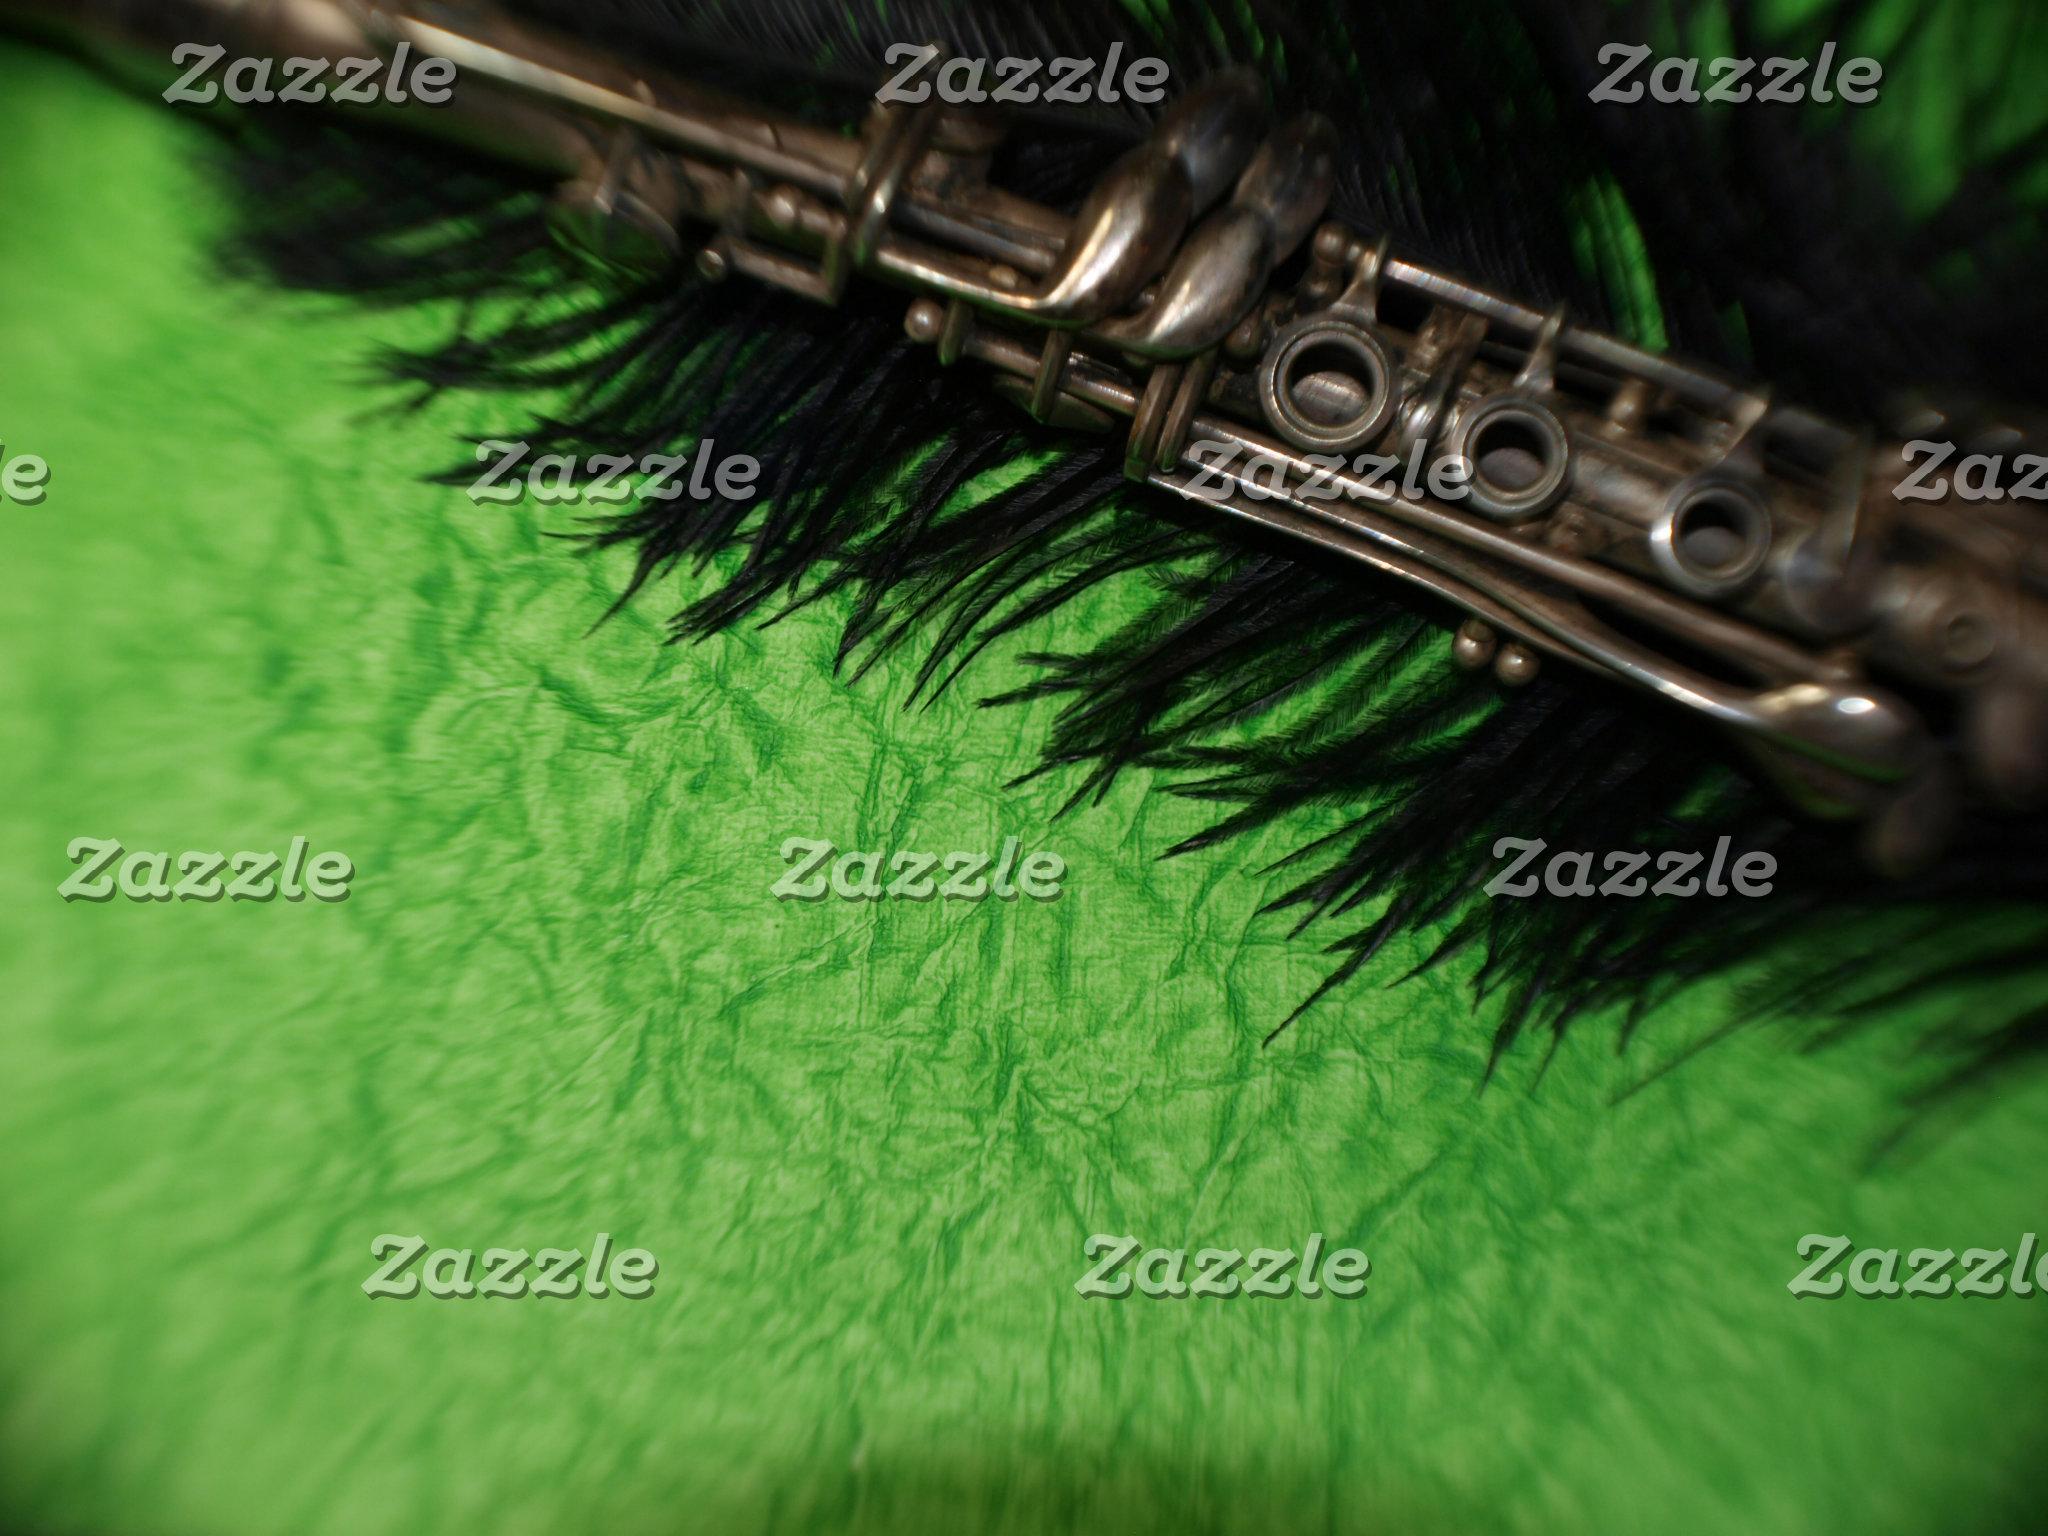 Musical Intruments